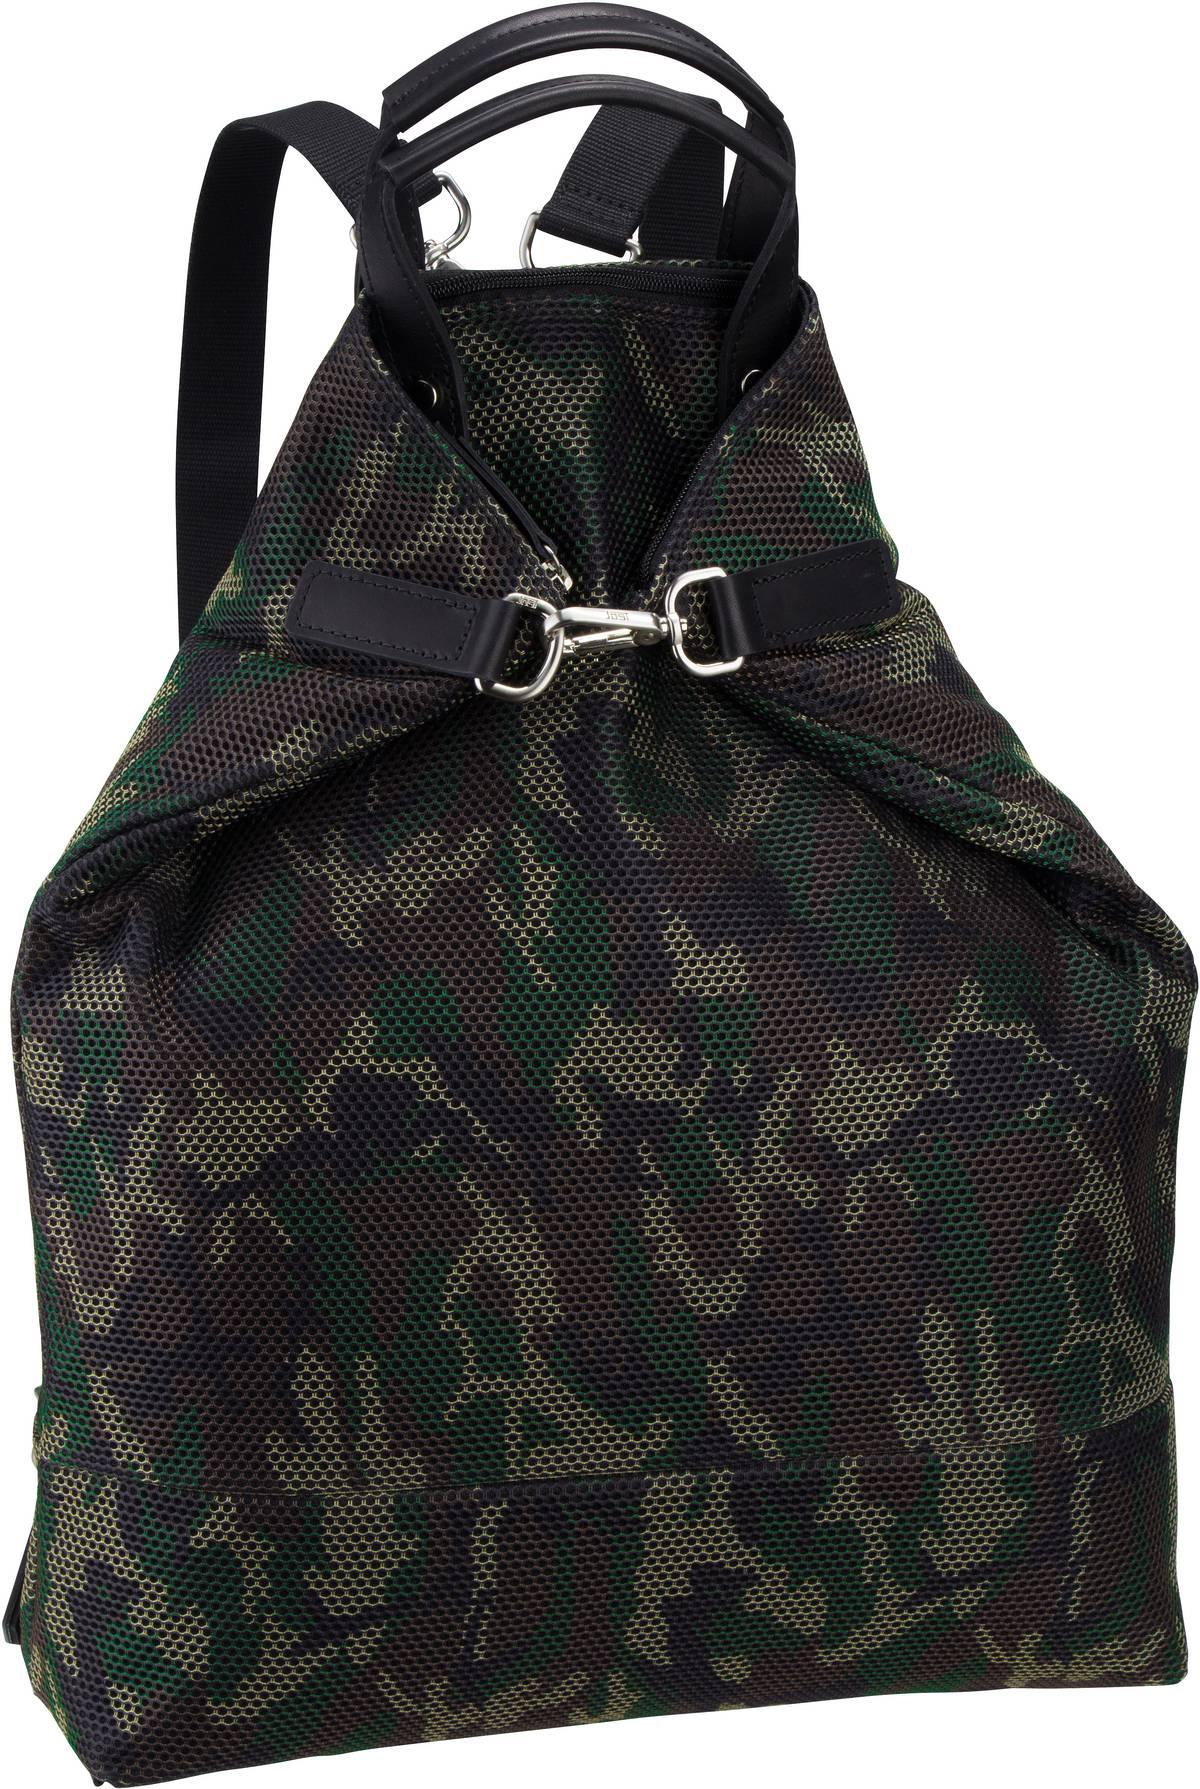 Laptoprucksack Mesh 6179 X-Change 3in1 Bag L Camouflage